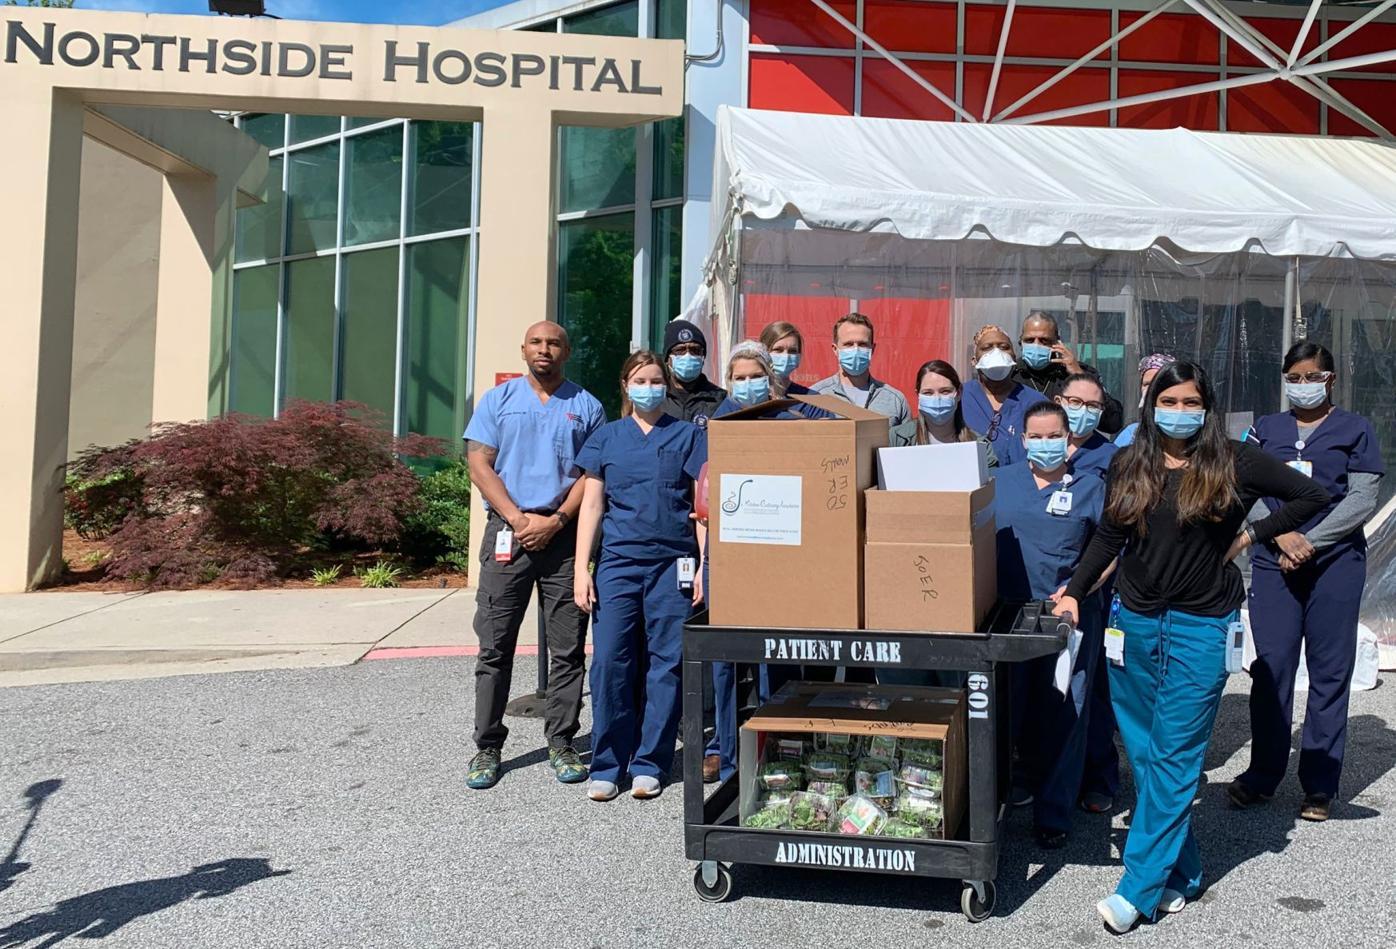 042920_MNS_full_Usher_meals_001 Northside Hospital emergency room staff members